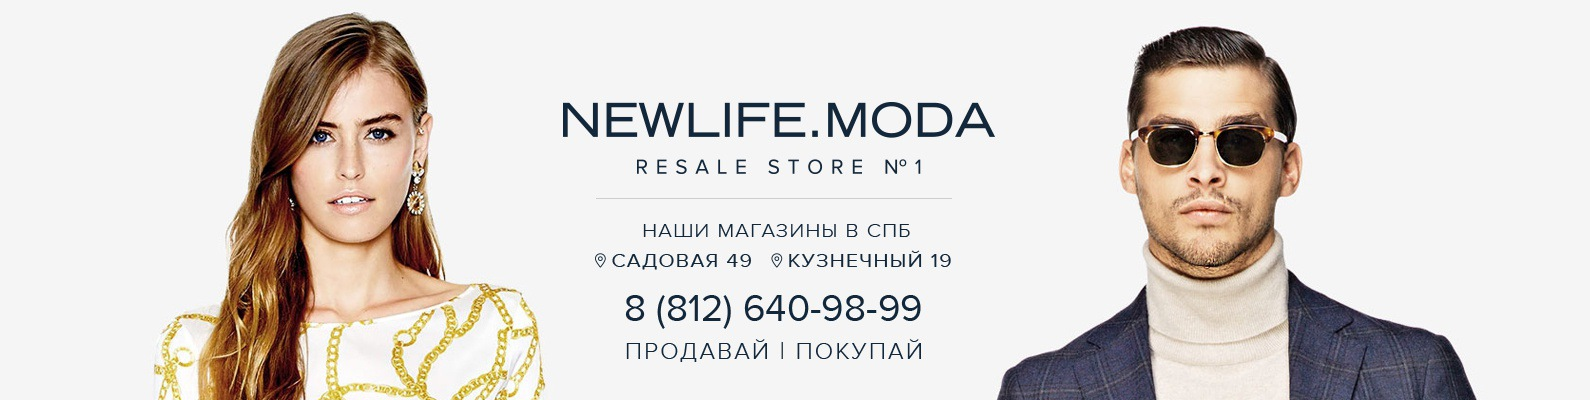 fcc9ea09ed069 NEWLIFE.MODA RESALE STORE №1   ВКонтакте